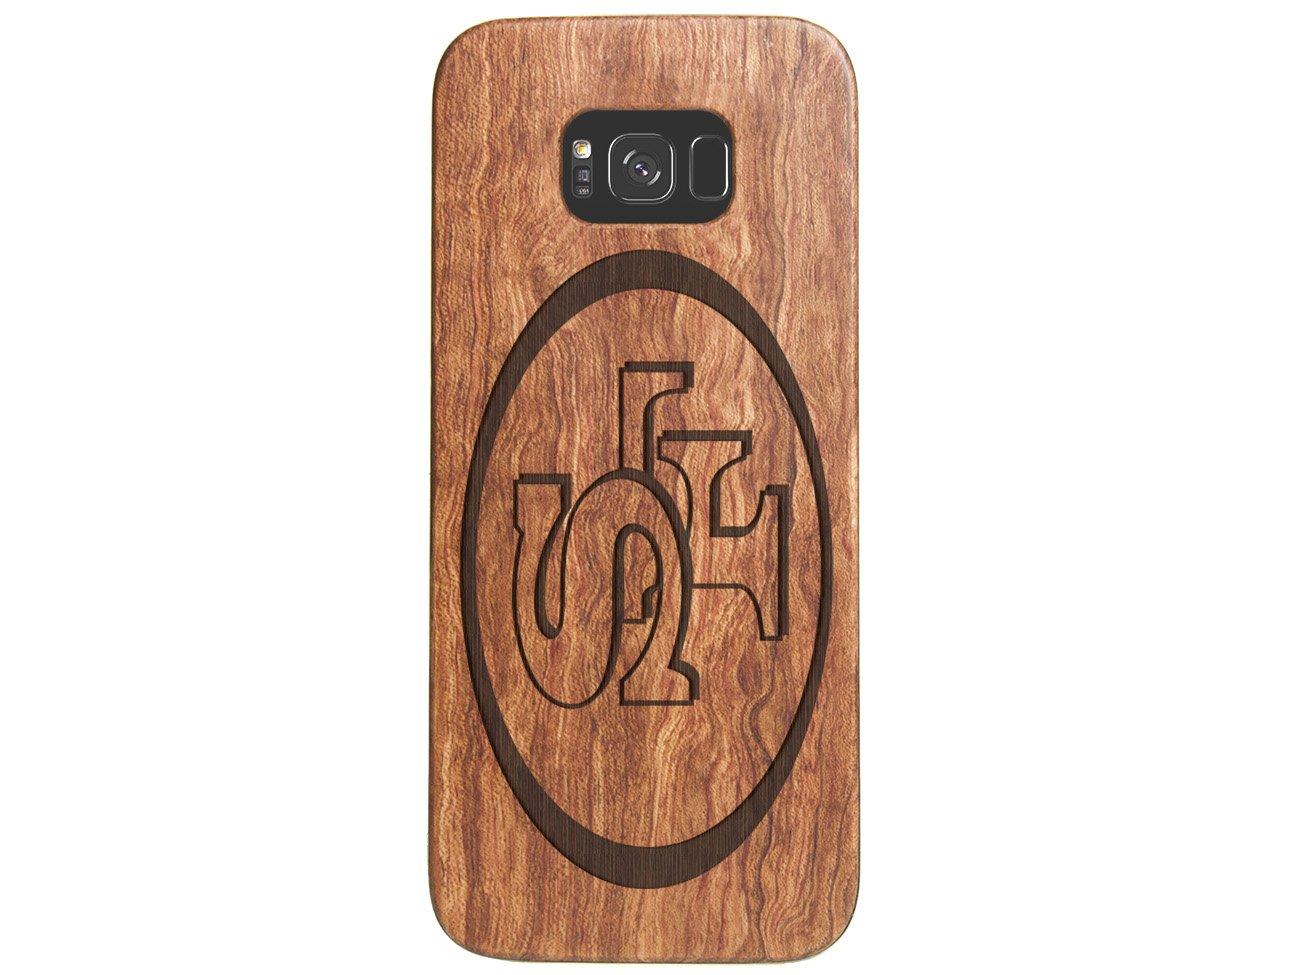 Ers Iphone  Case